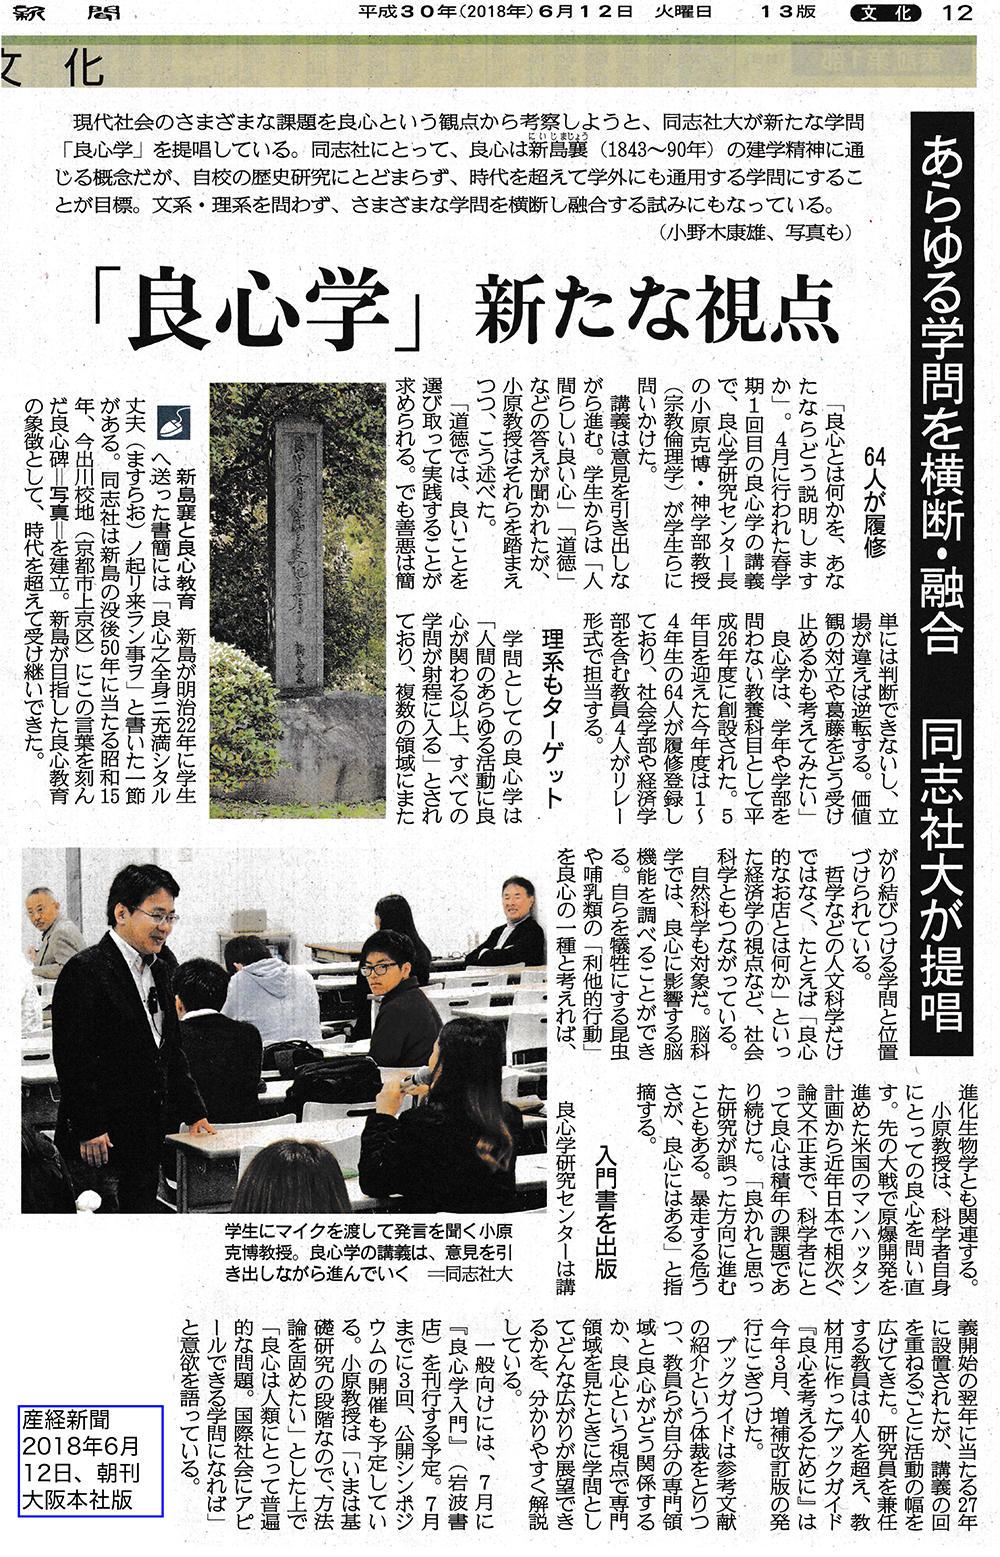 http://www.kohara.ac/essays/Sankei20180612m.jpg